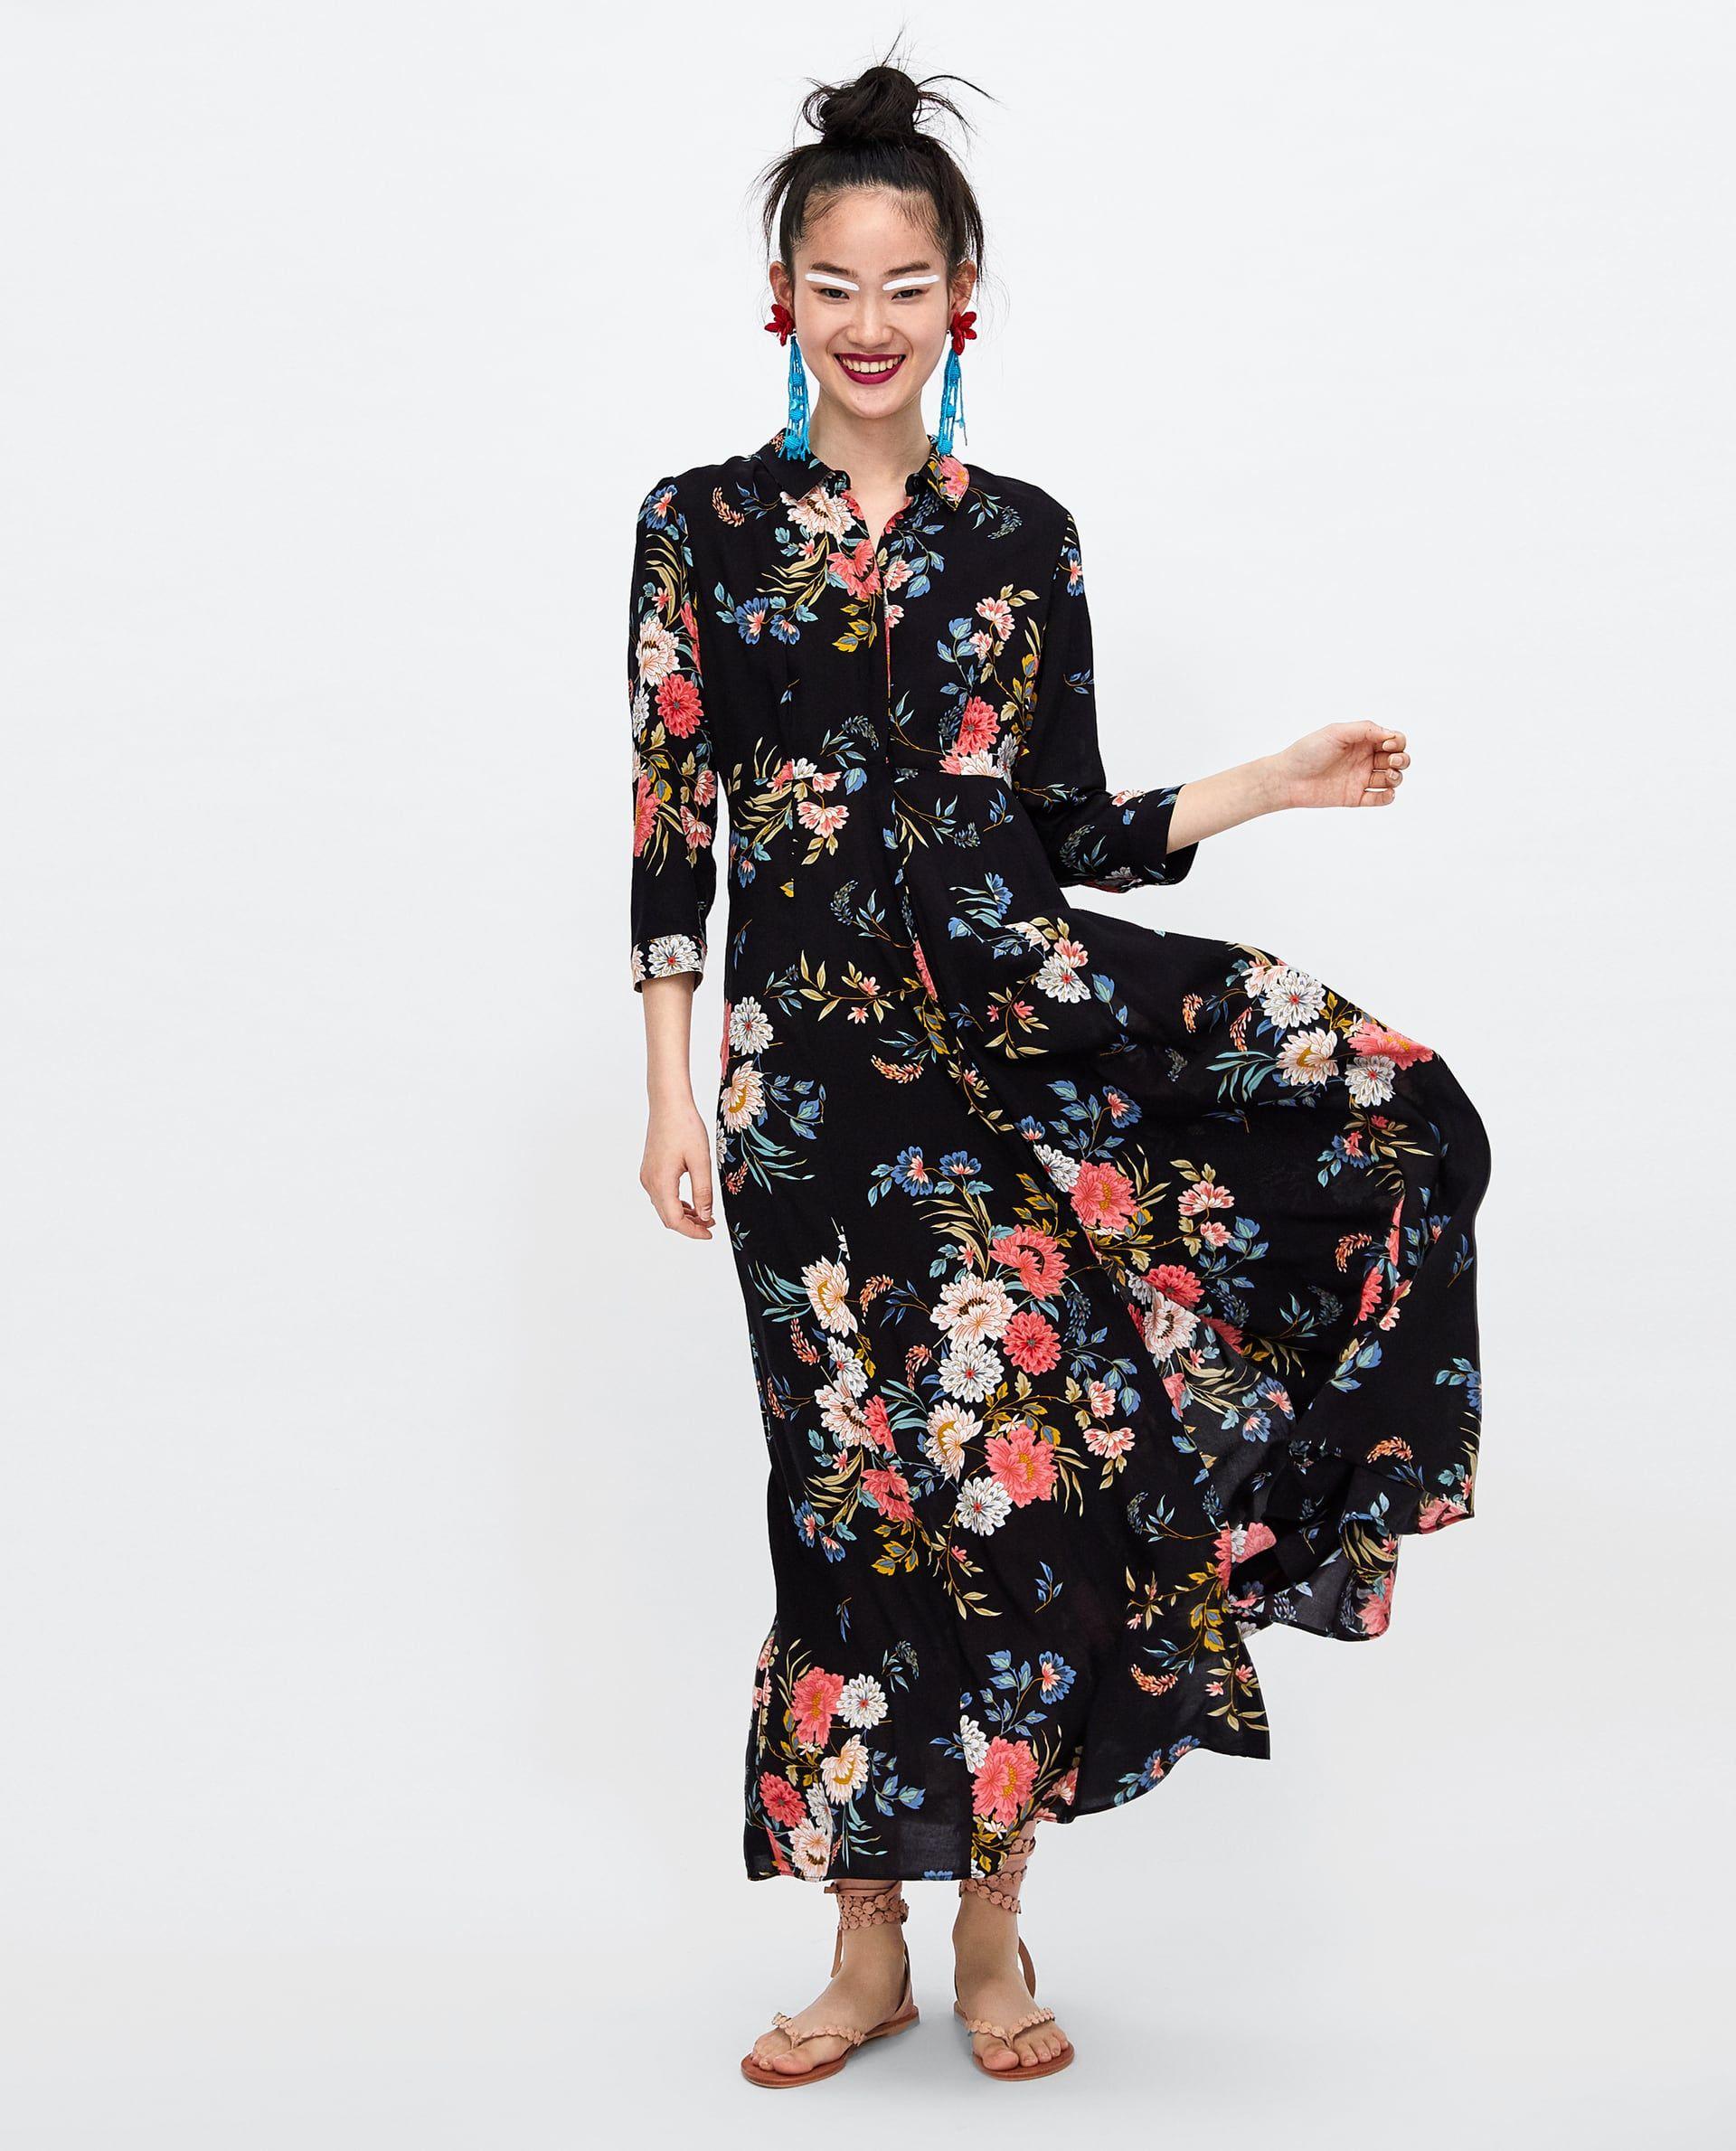 aa4ae5694 ZARA - WOMAN - LONG FLORAL PRINT DRESS